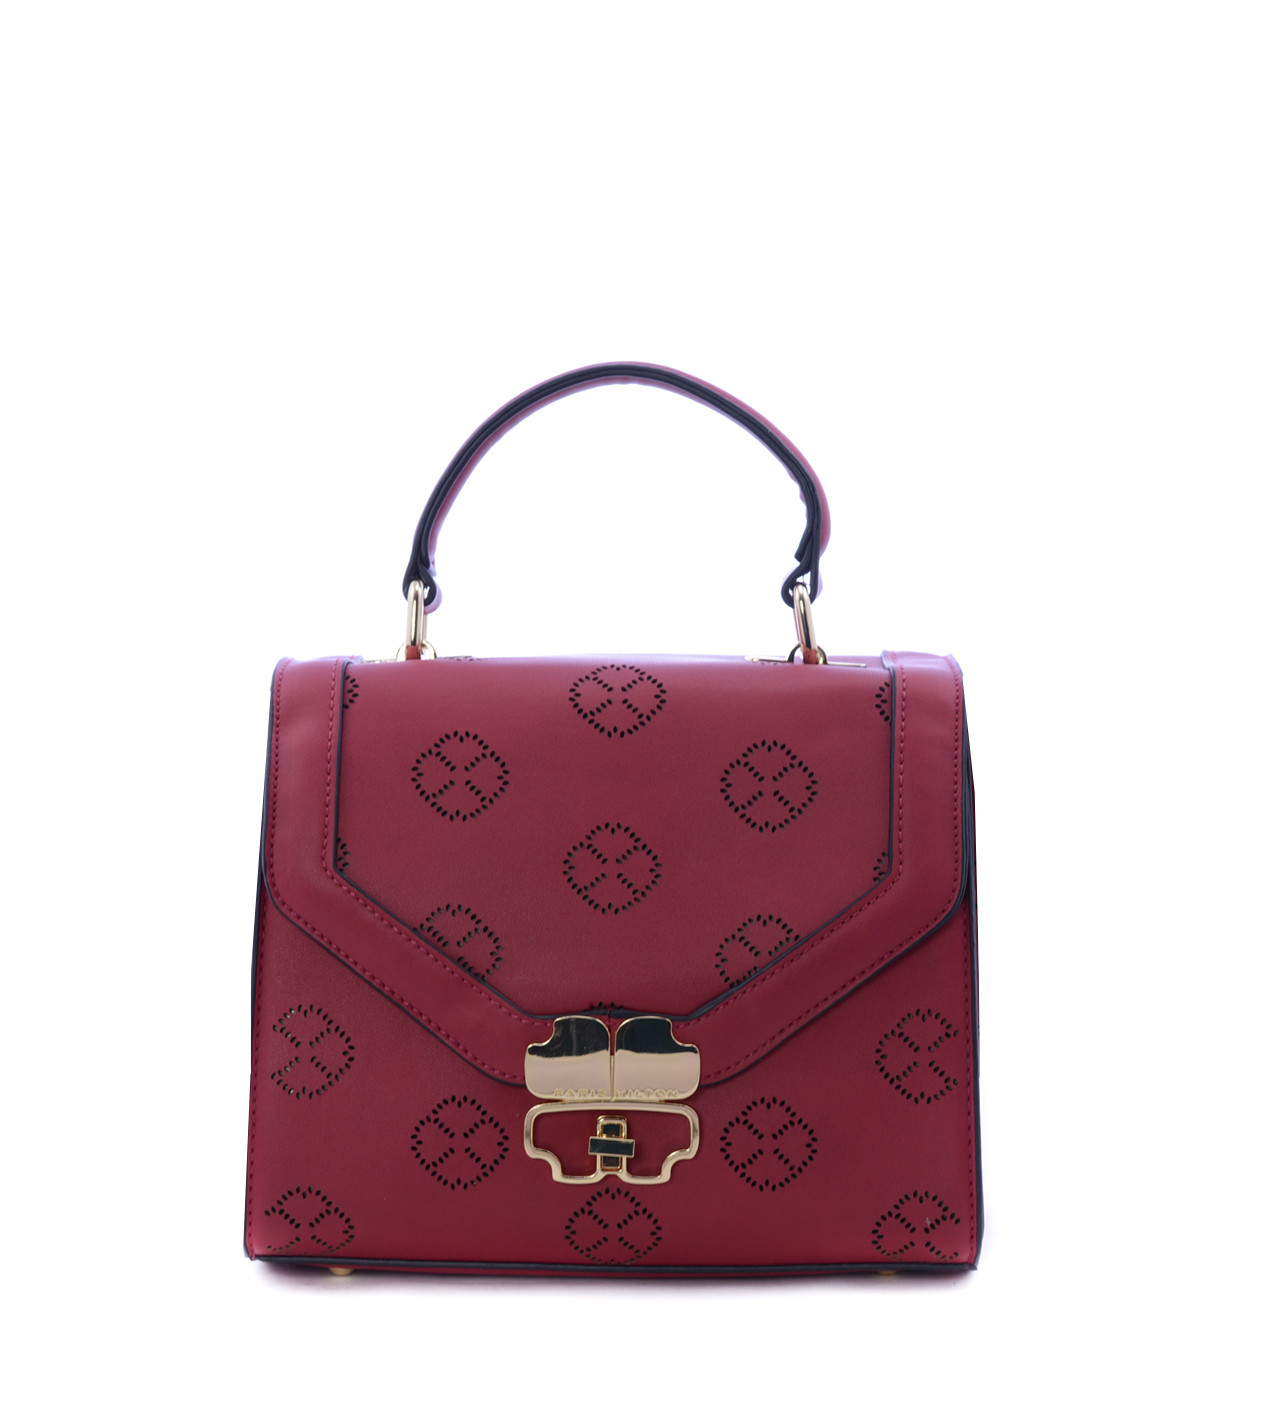 a08db46d77 Paris Hilton Φούξια Τσαντάκι Χειρός (Bags)